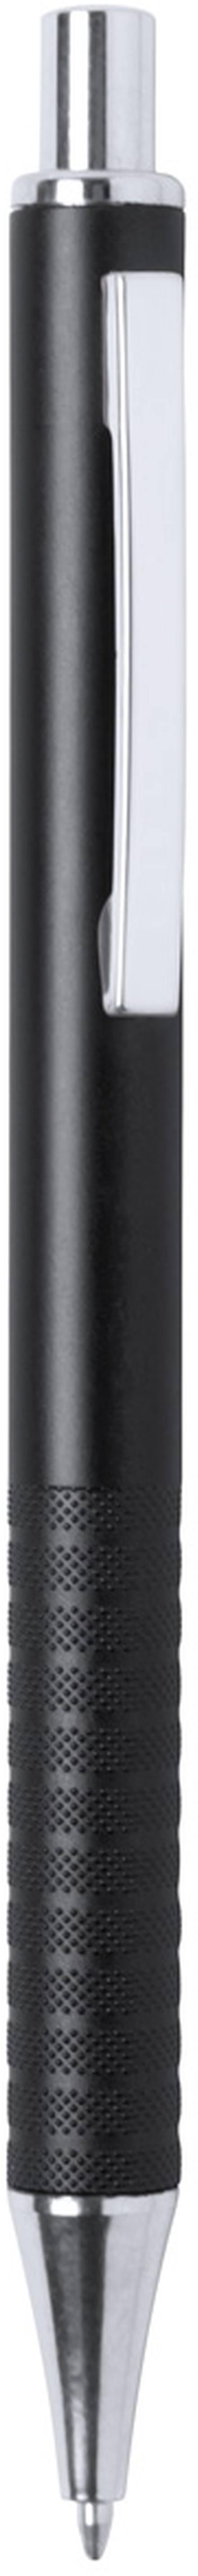 Tikel kuličkové pero